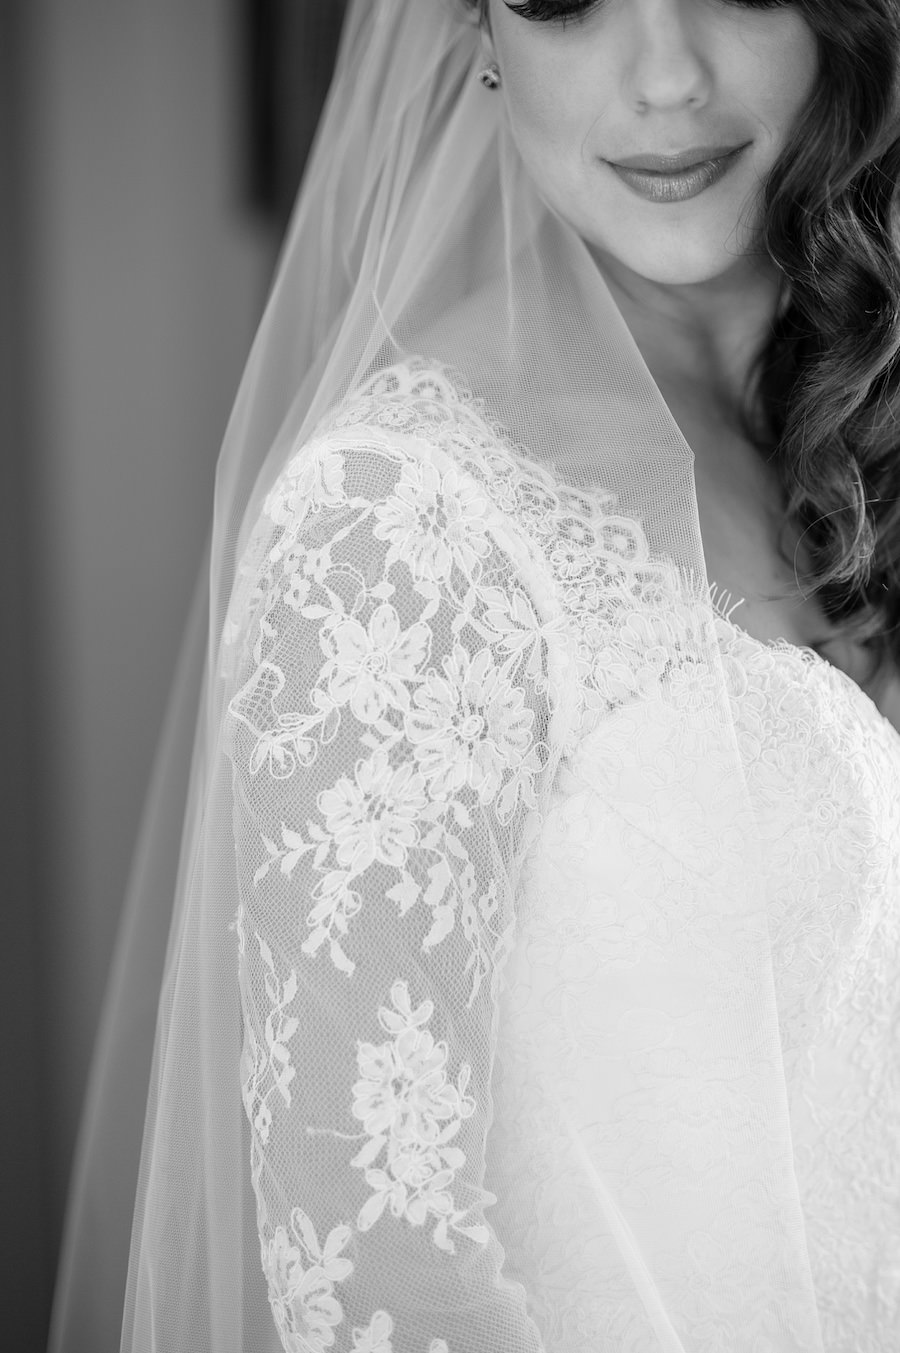 Bridal Wedding Dress Detail | Ivory, Lace Long Sleeve Wedding Dress and Chapel Veil